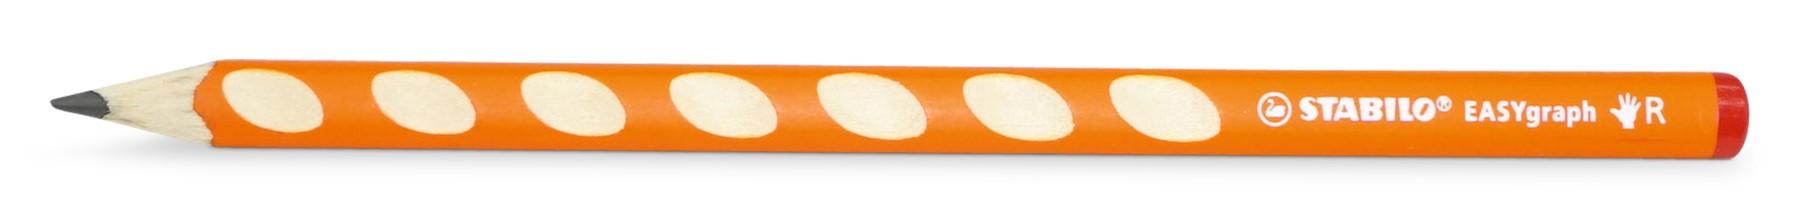 Stabilo Easygraph Bleistift, weich